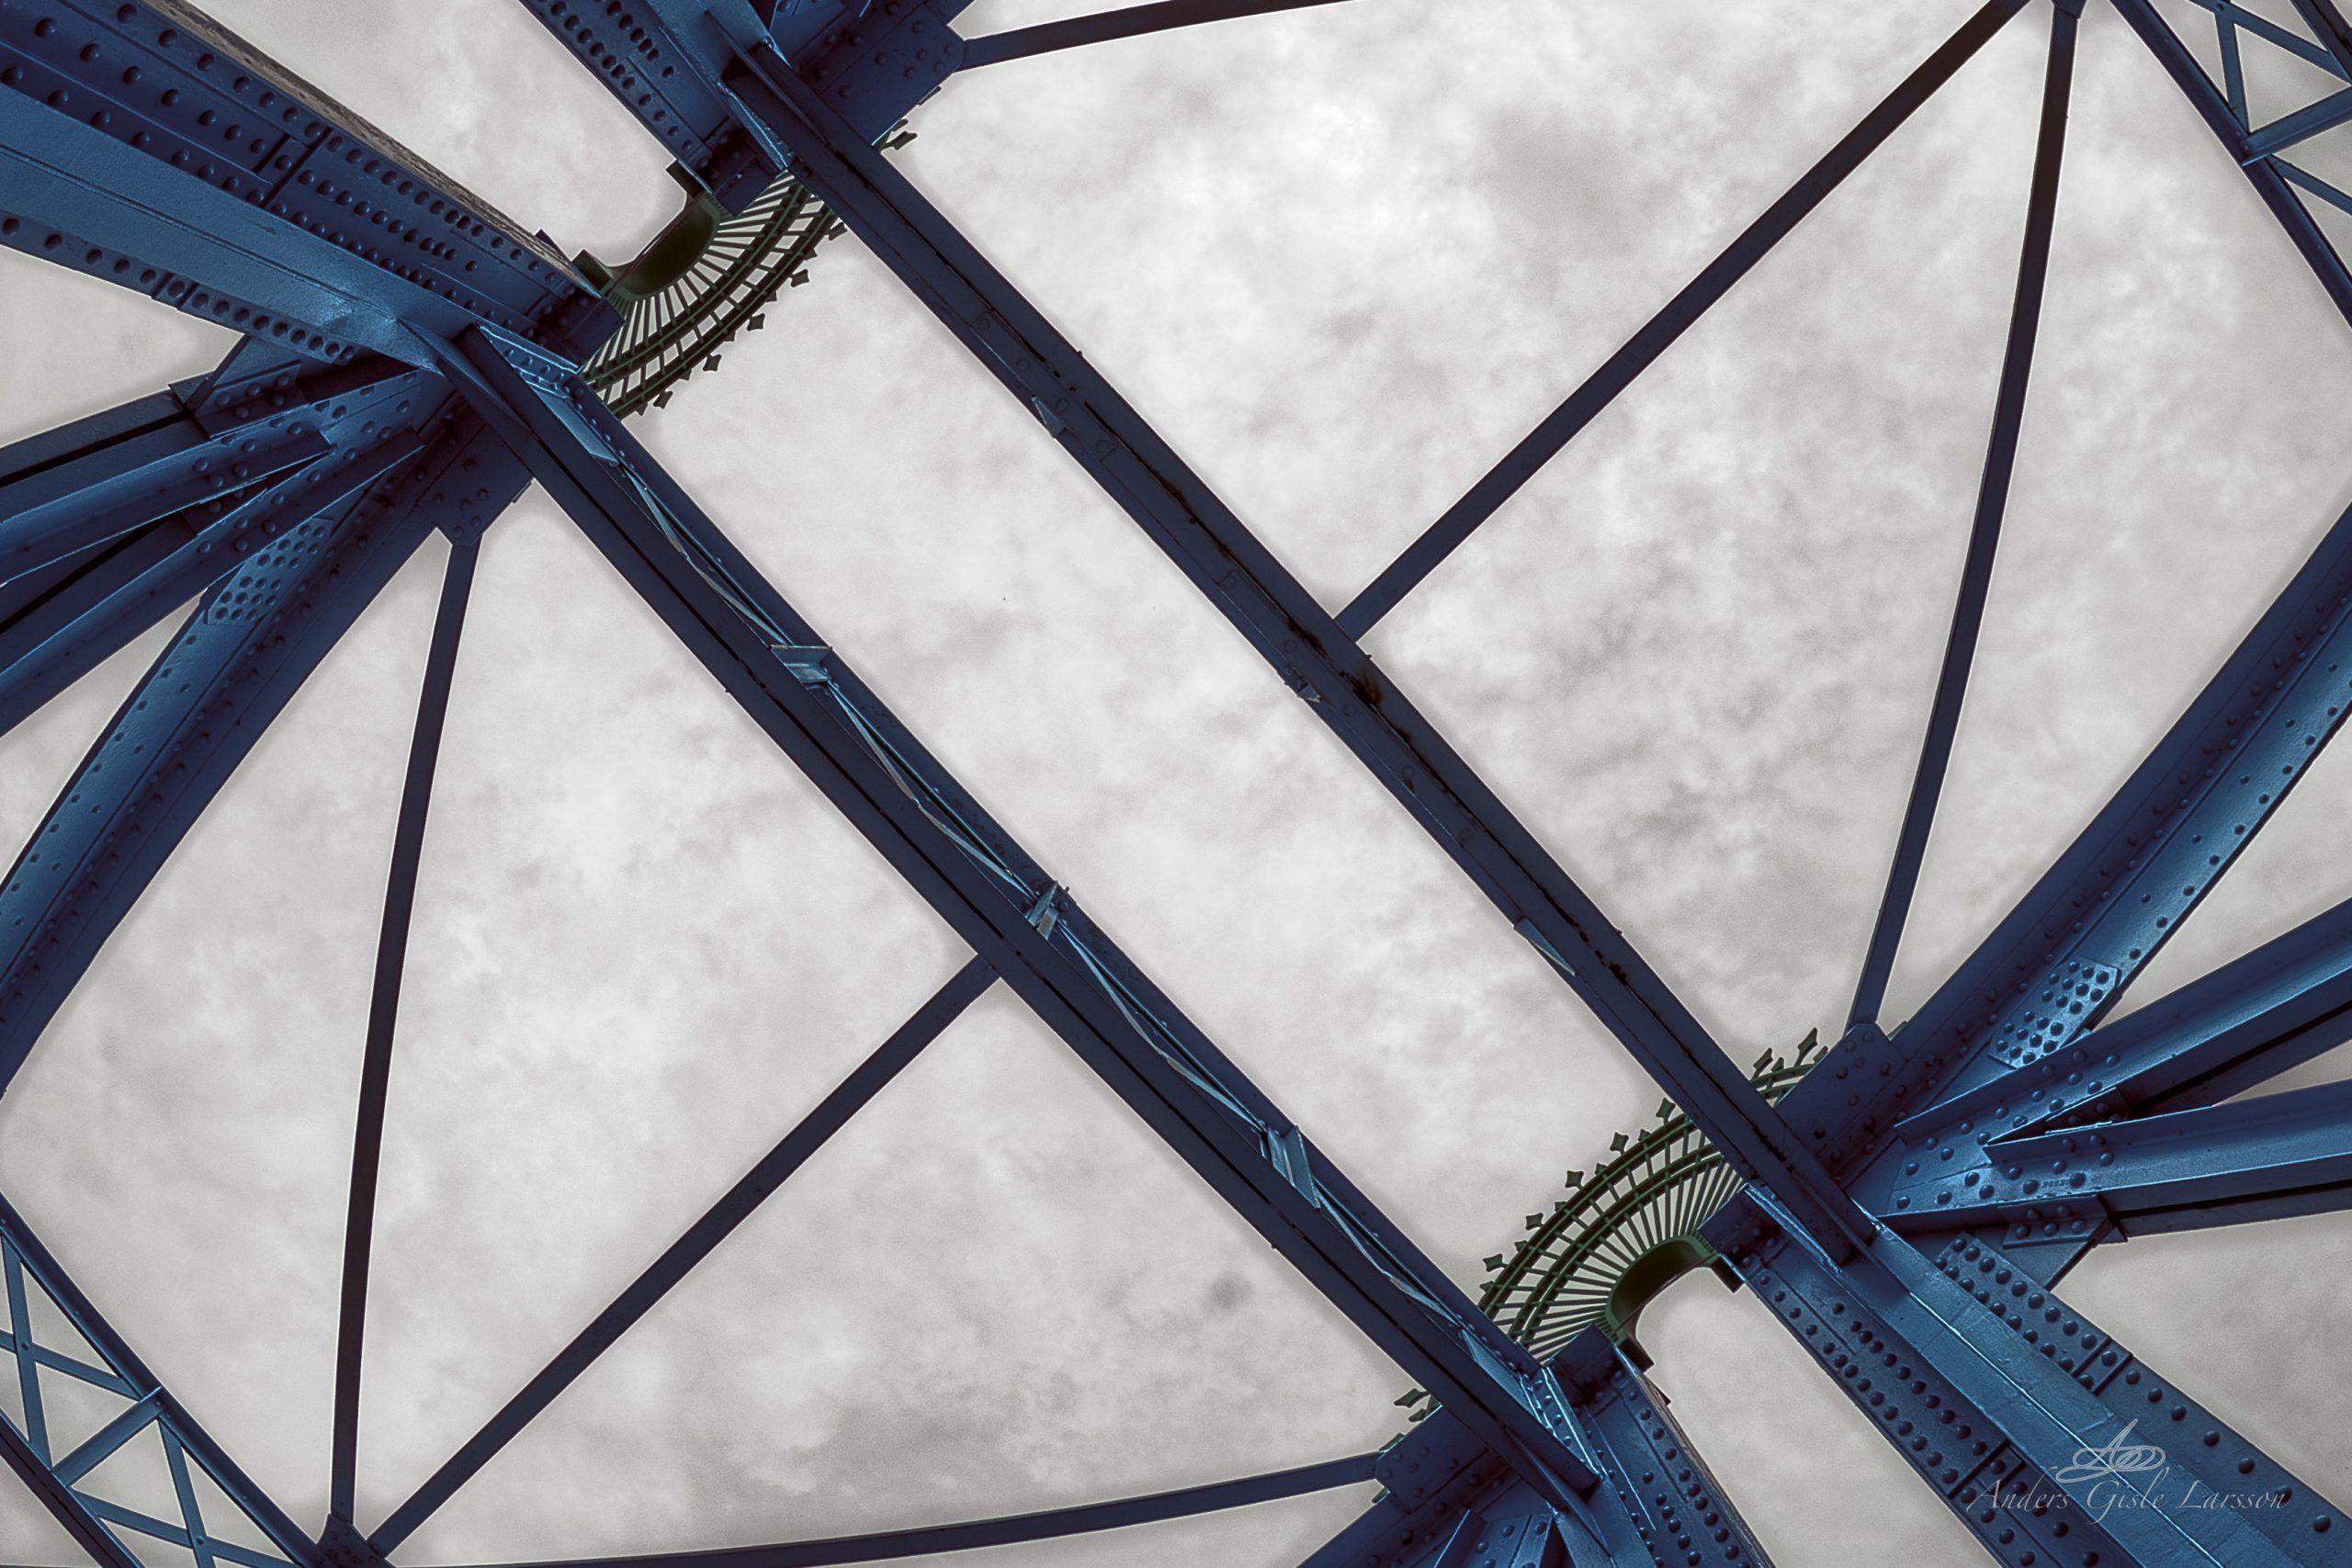 Blue Sky, Uge 37, Fiskeøje, Den Blå Bro, Gudenåen, Randers